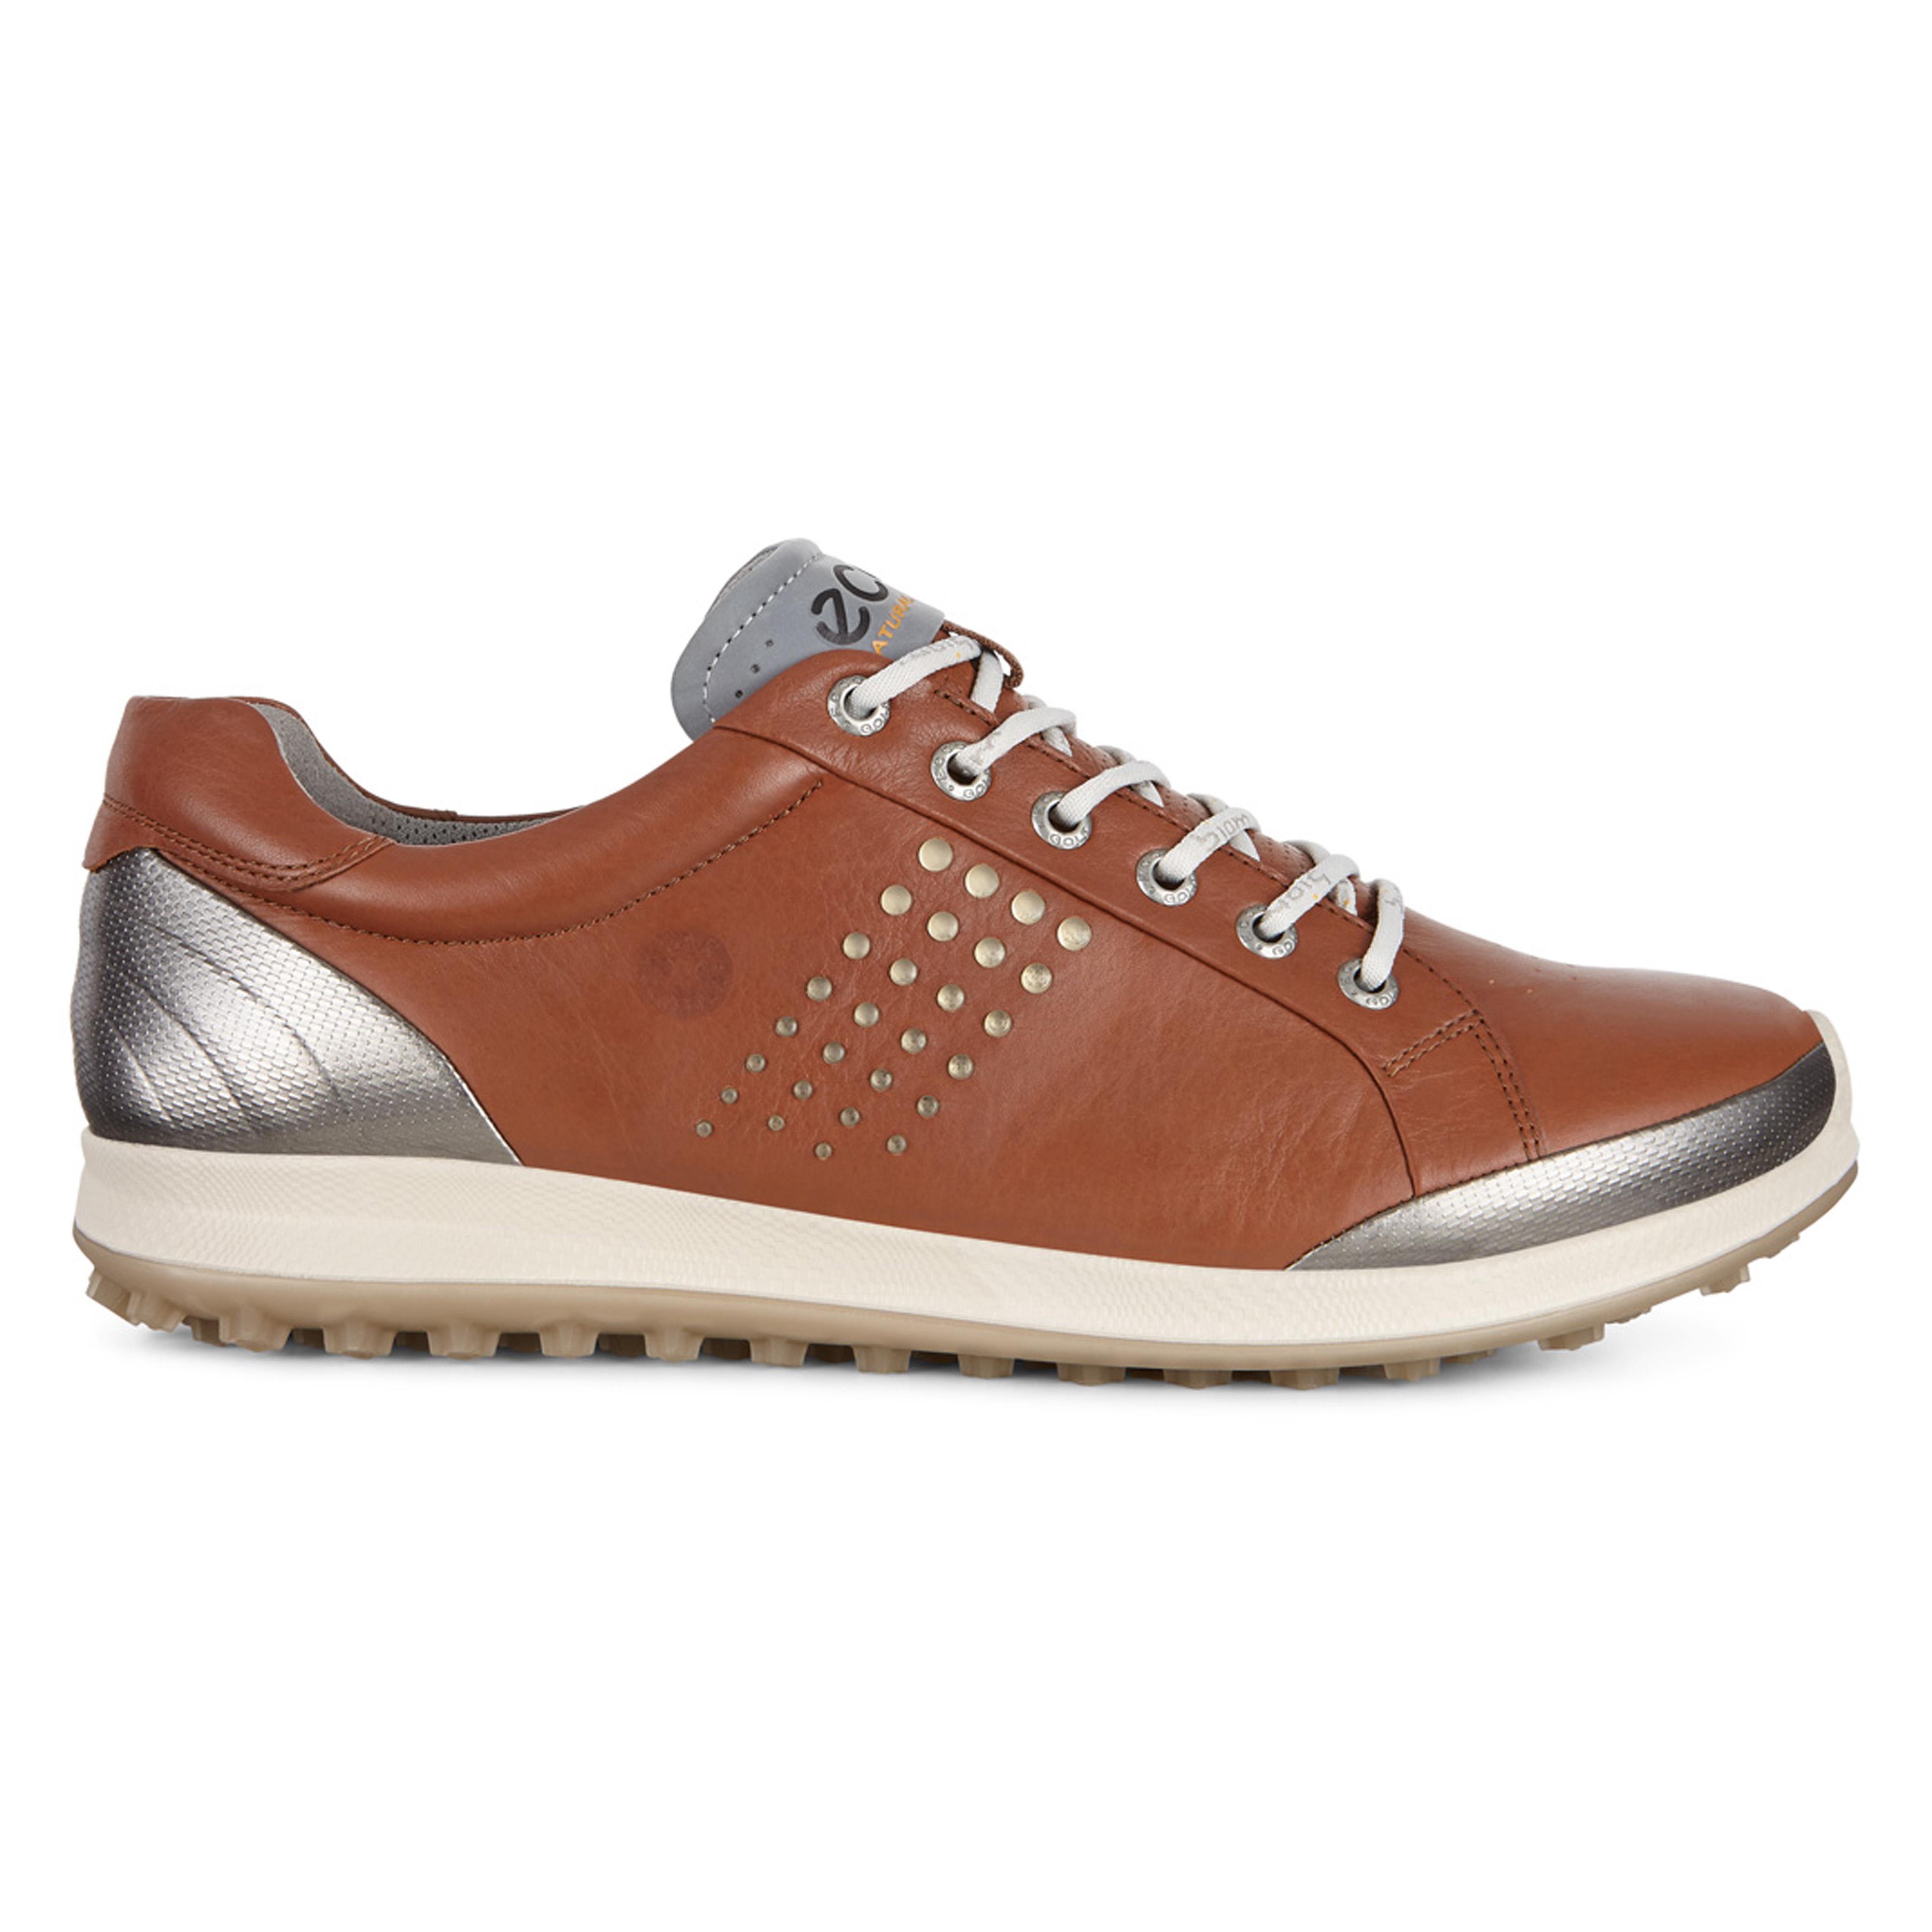 Ecco Men S Biom Hybrid 2 Golf Shoes Golf Equipment And Accessories Worldwide Golf Shops